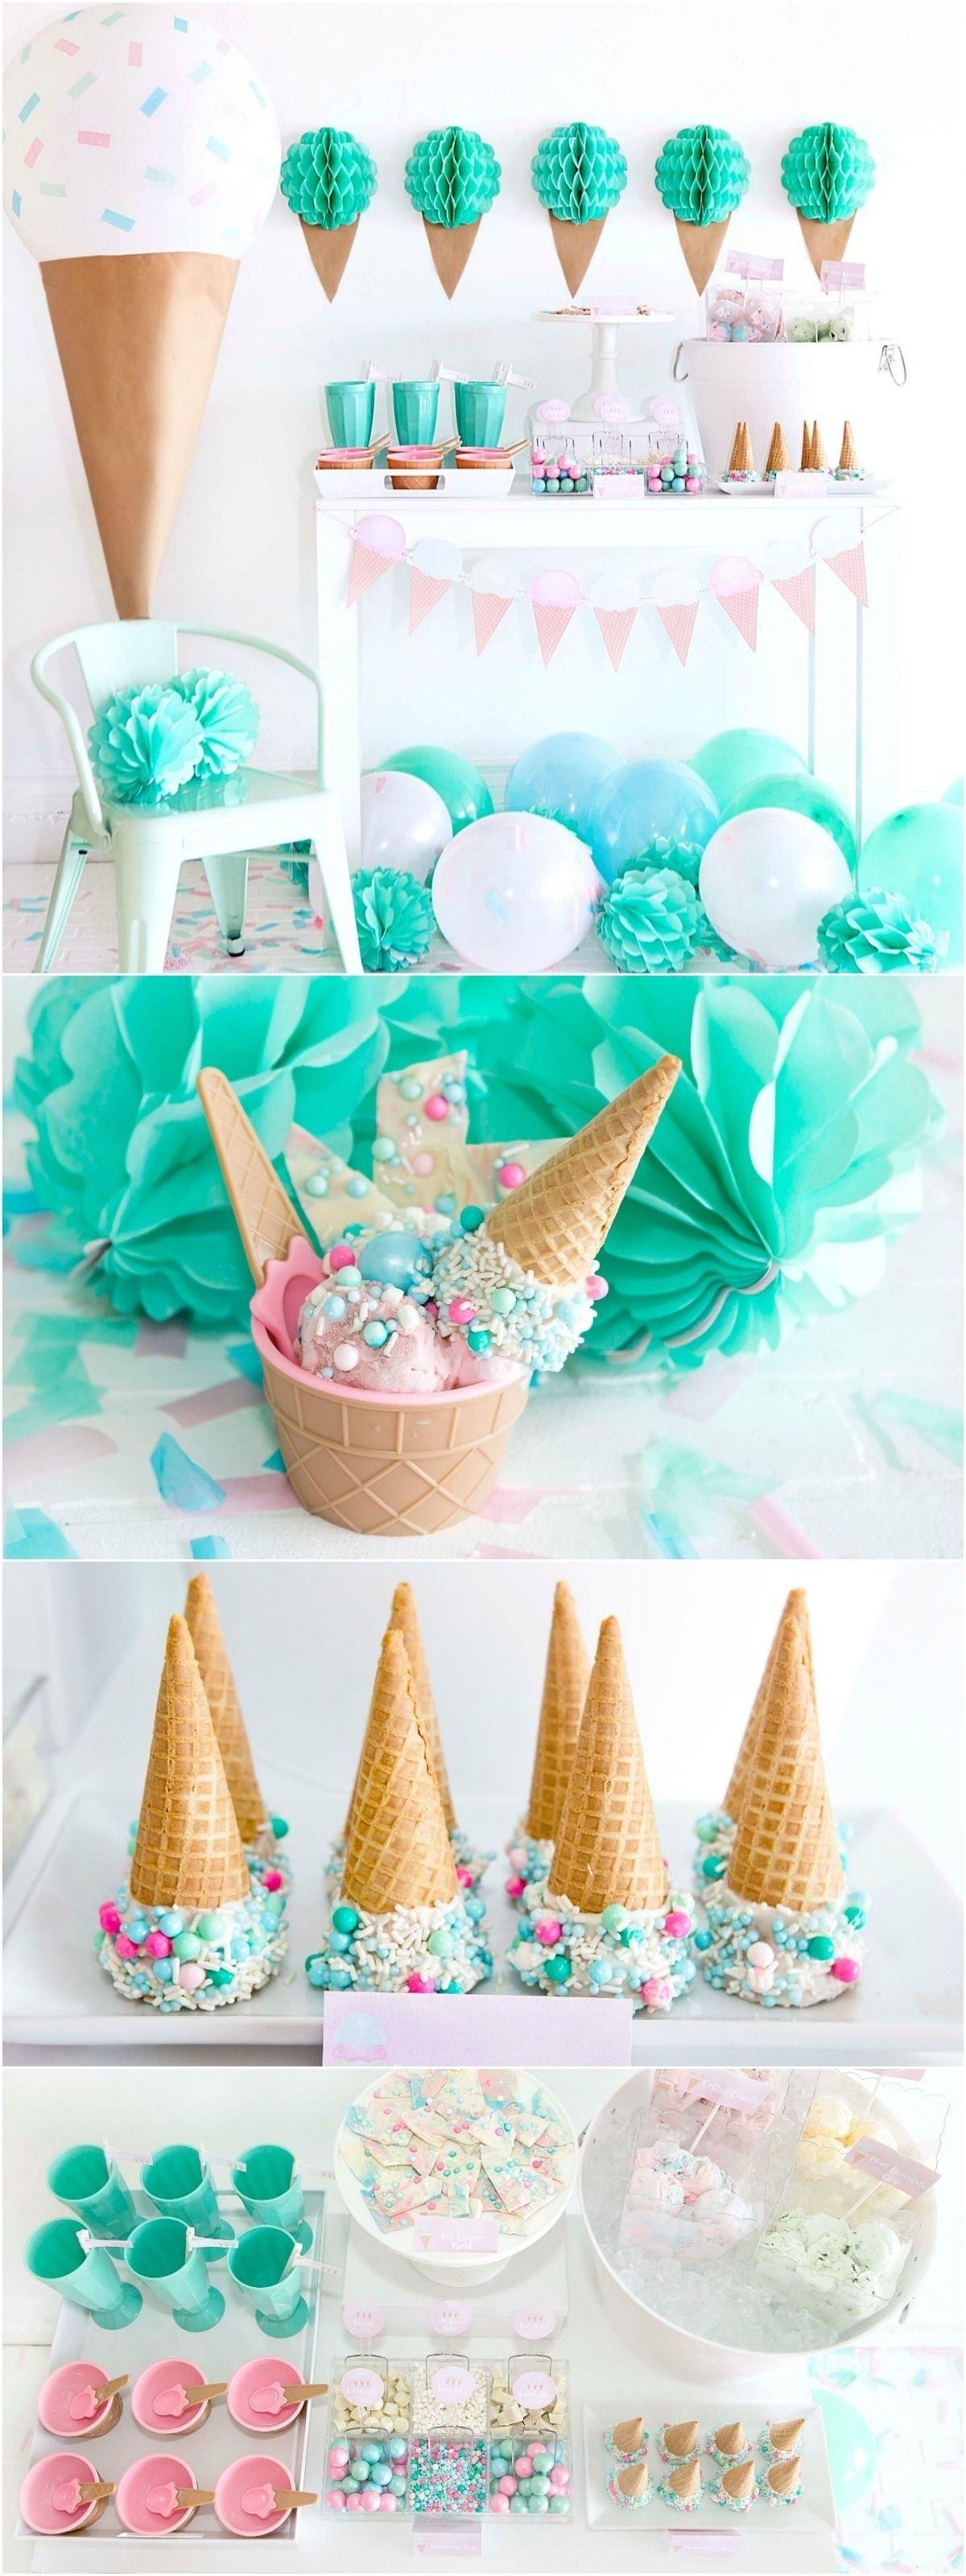 10 Fabulous Ice Cream Birthday Party Ideas ice cream party mint green aqua and light pink party maeva 2020